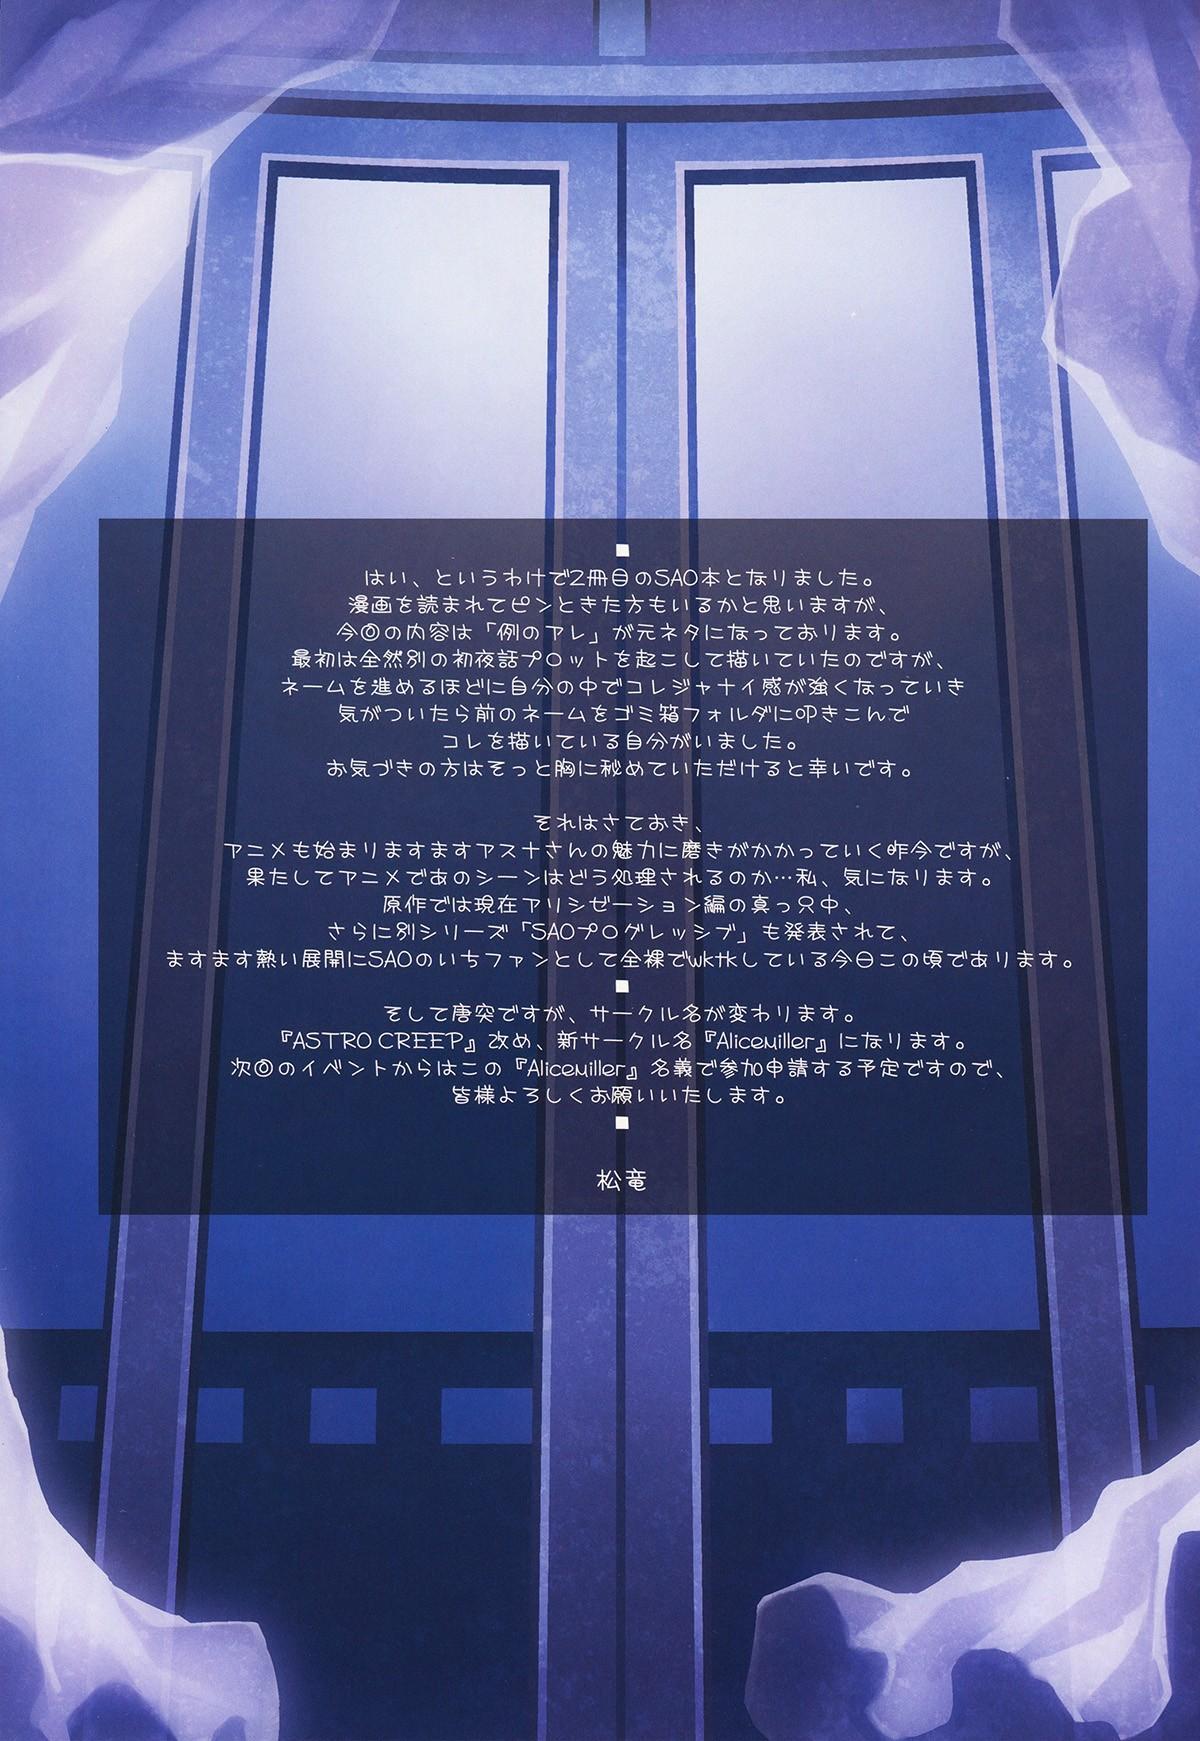 [Astro Creep (Matsuryu)] Sword Art Unlimited (Sword Art Online) [ENG]v2 25